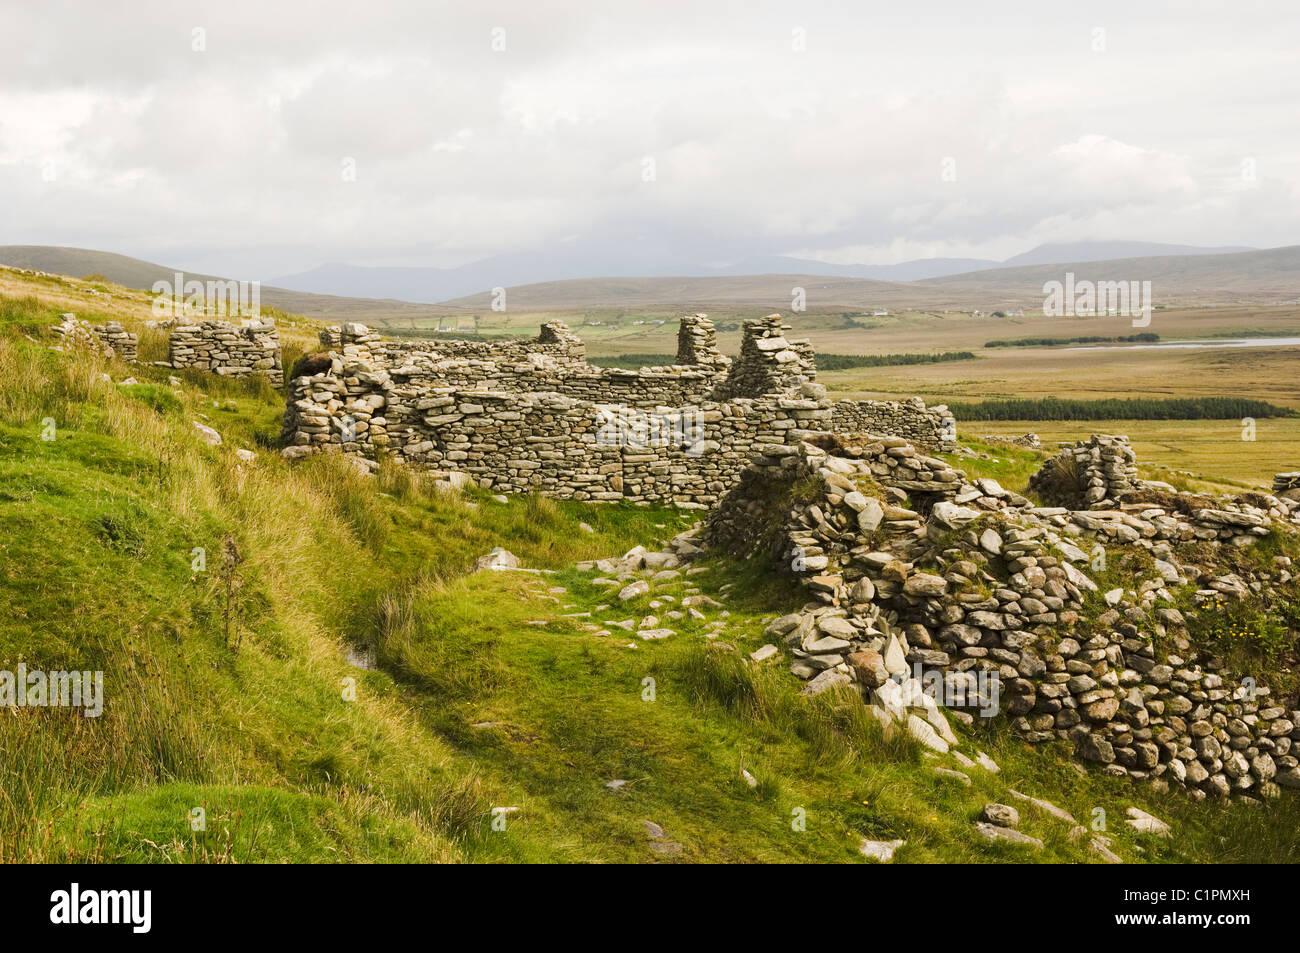 Republic of Ireland, County Mayo, Achill Island, Slievemore, old ruins - Stock Image